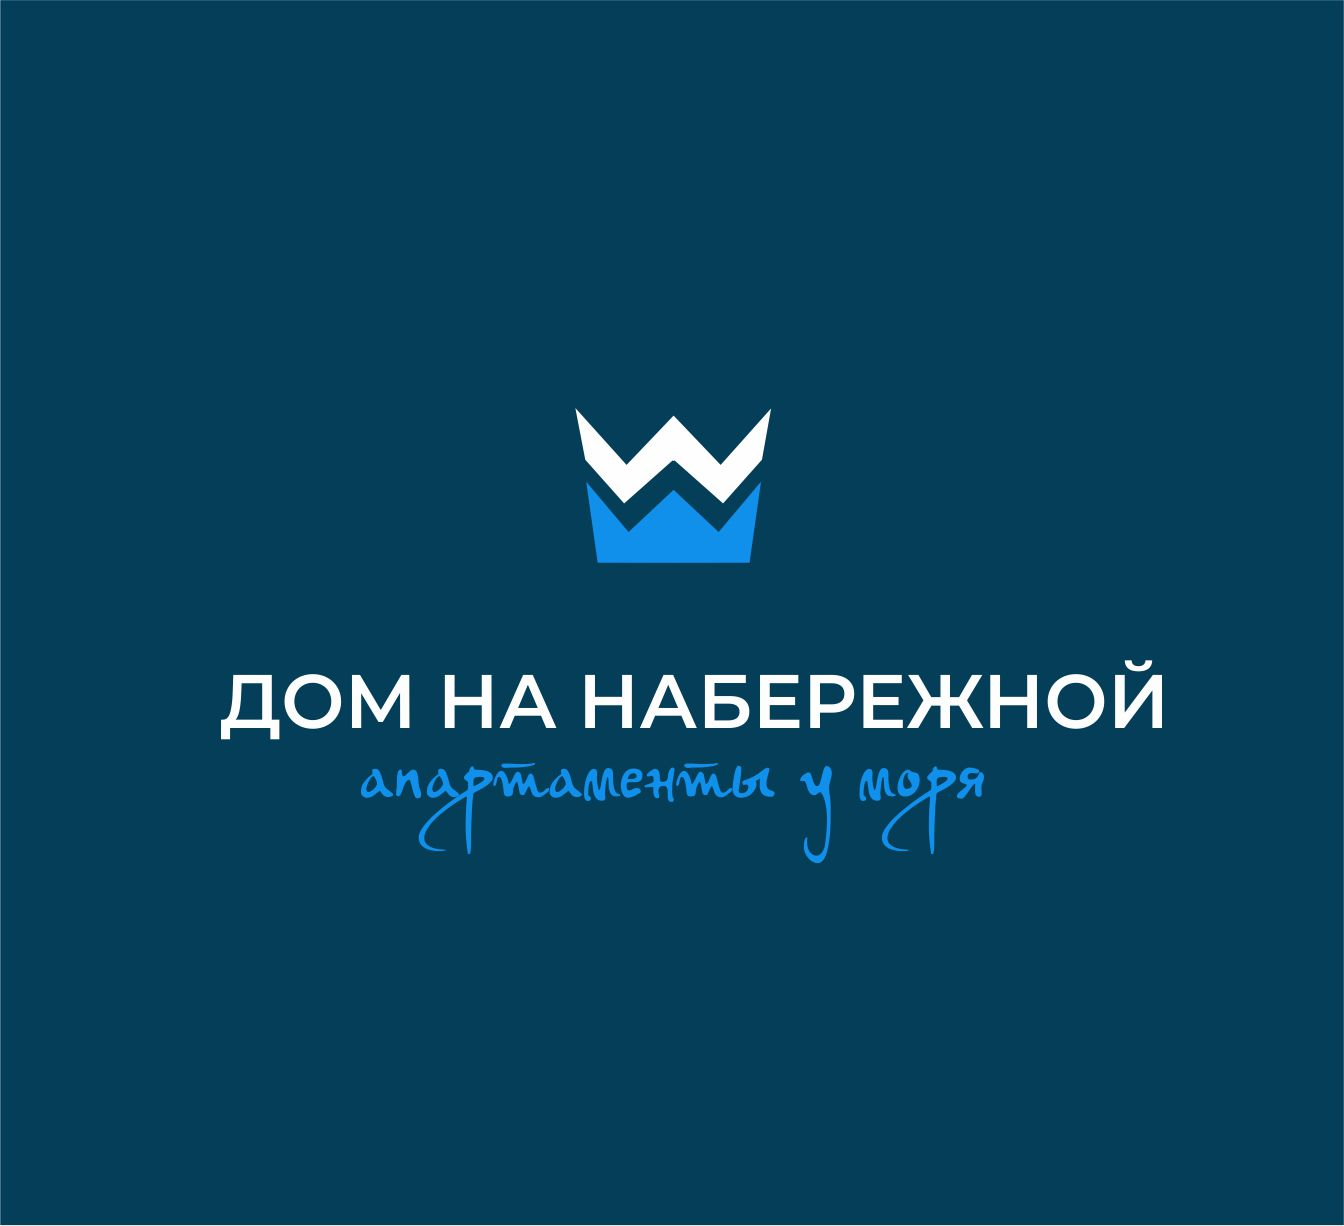 РАЗРАБОТКА логотипа для ЖИЛОГО КОМПЛЕКСА премиум В АНАПЕ.  фото f_2935de88e1f8fab2.jpg